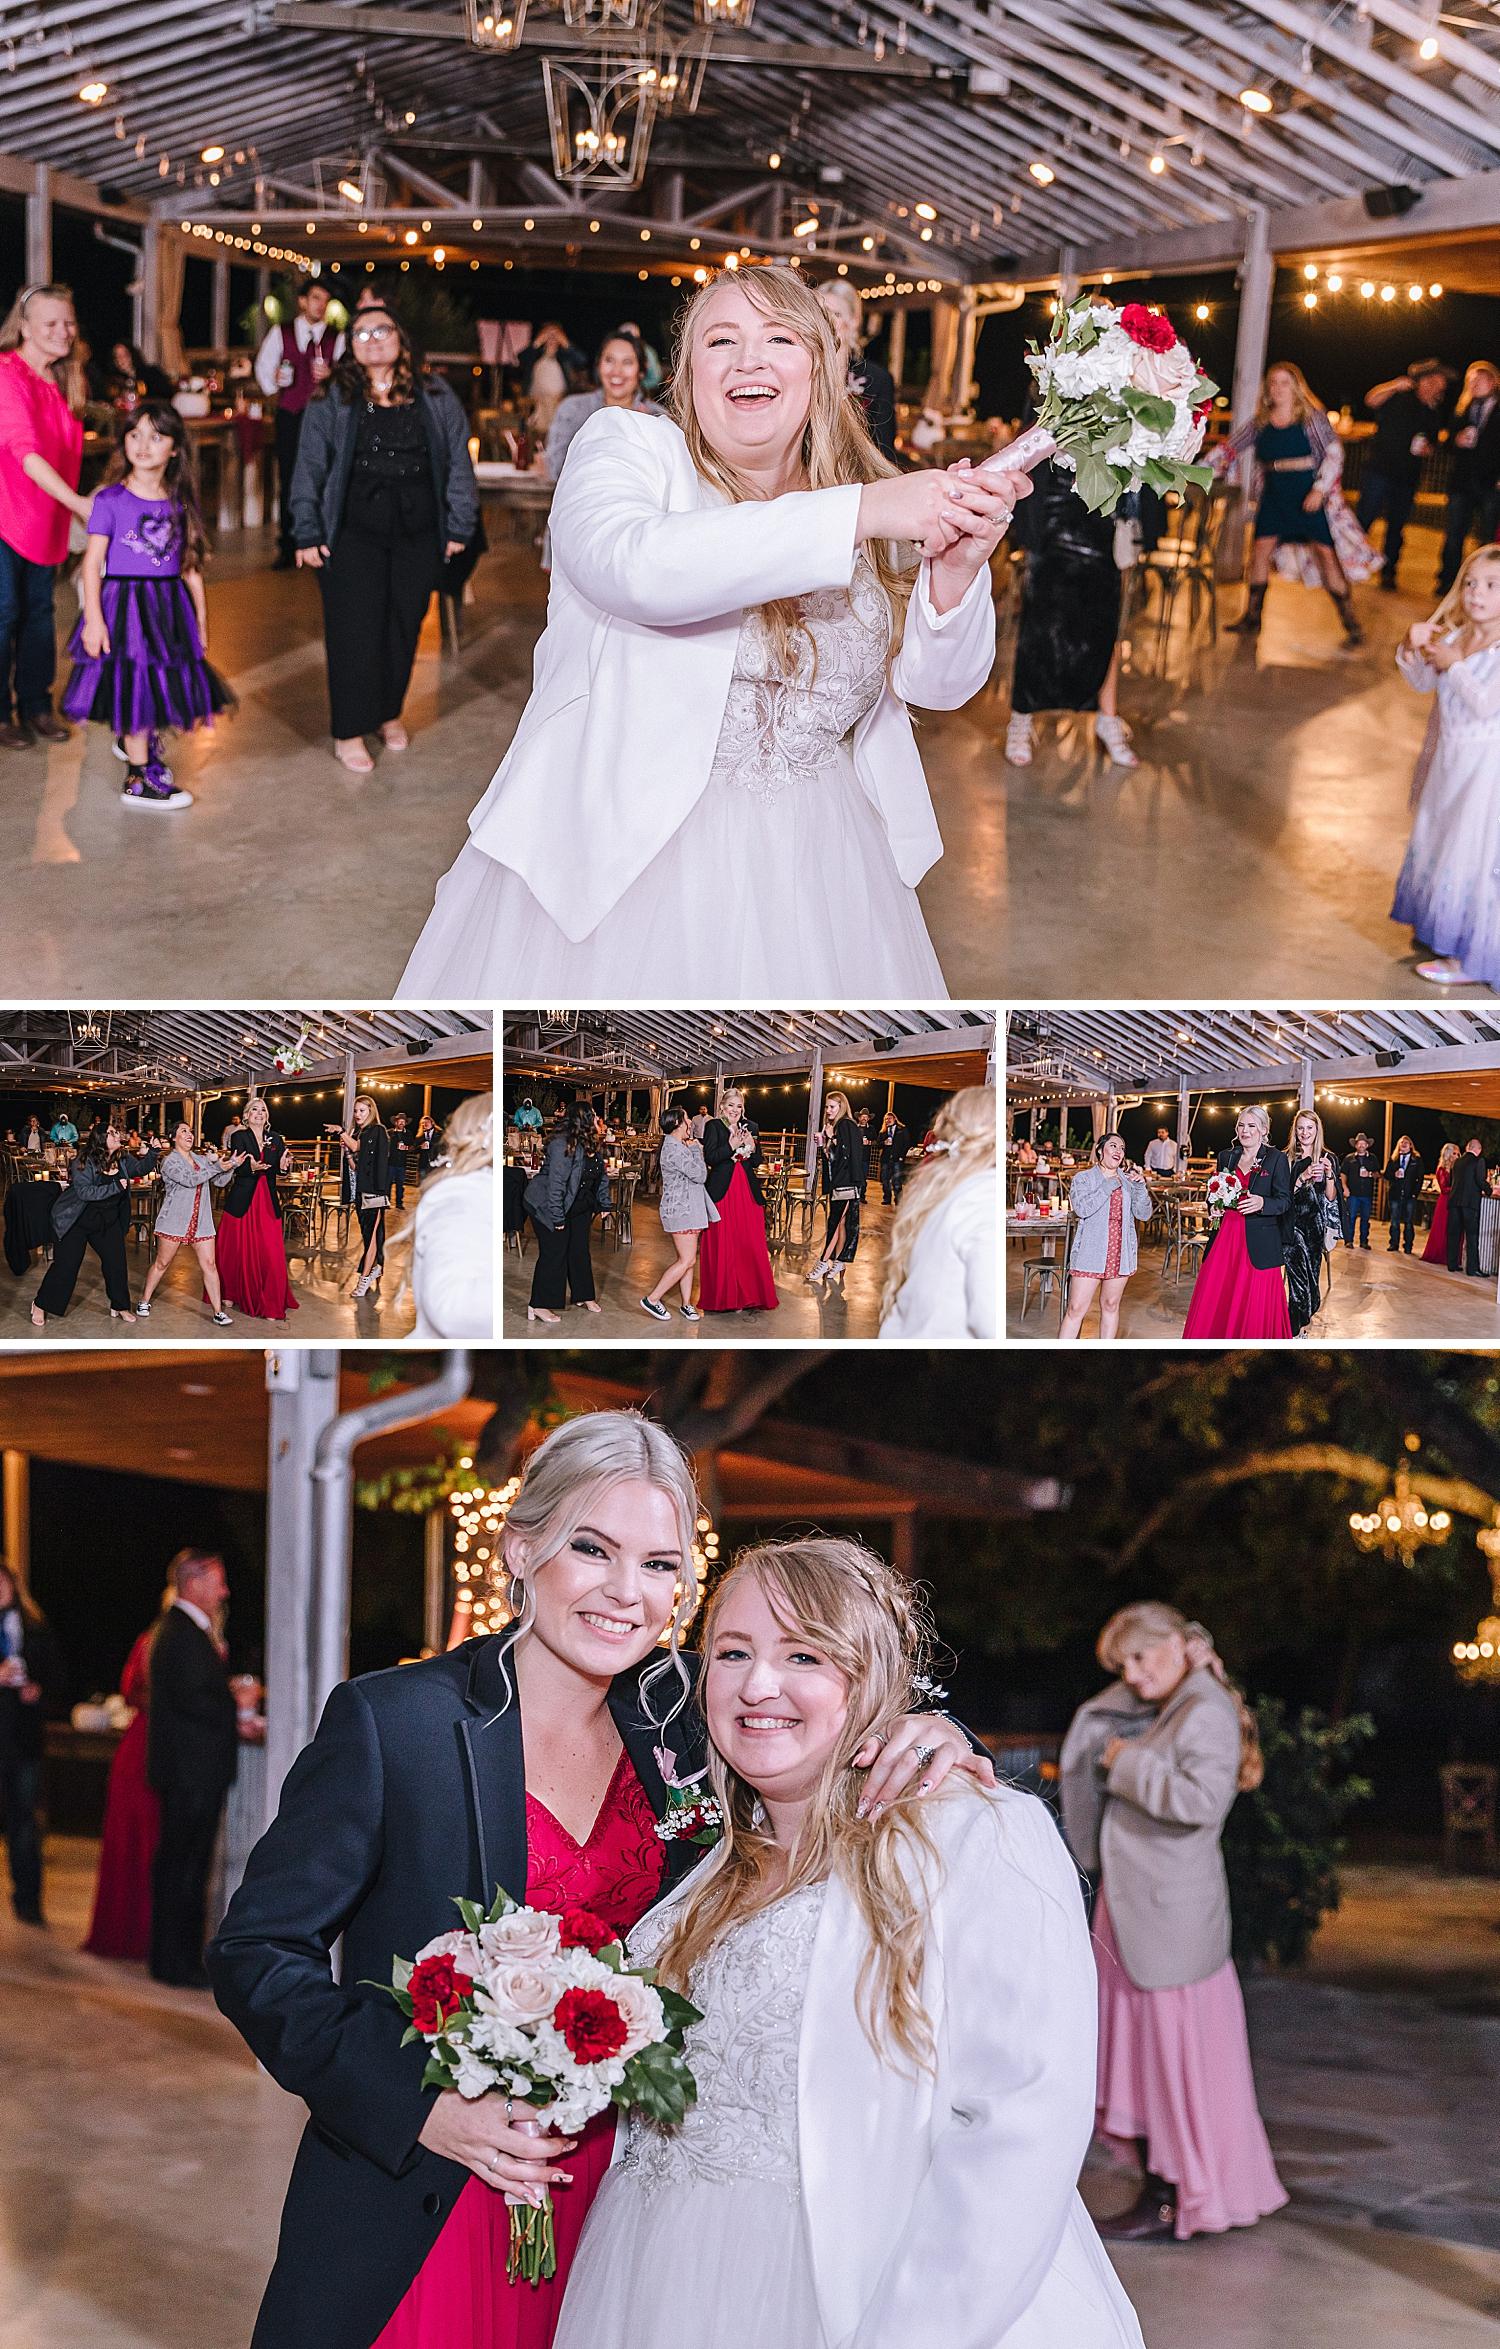 New-Braunfels-Wedding-Photographer-Gruene-Estate-Carly-Barton-Photography_0092.jpg